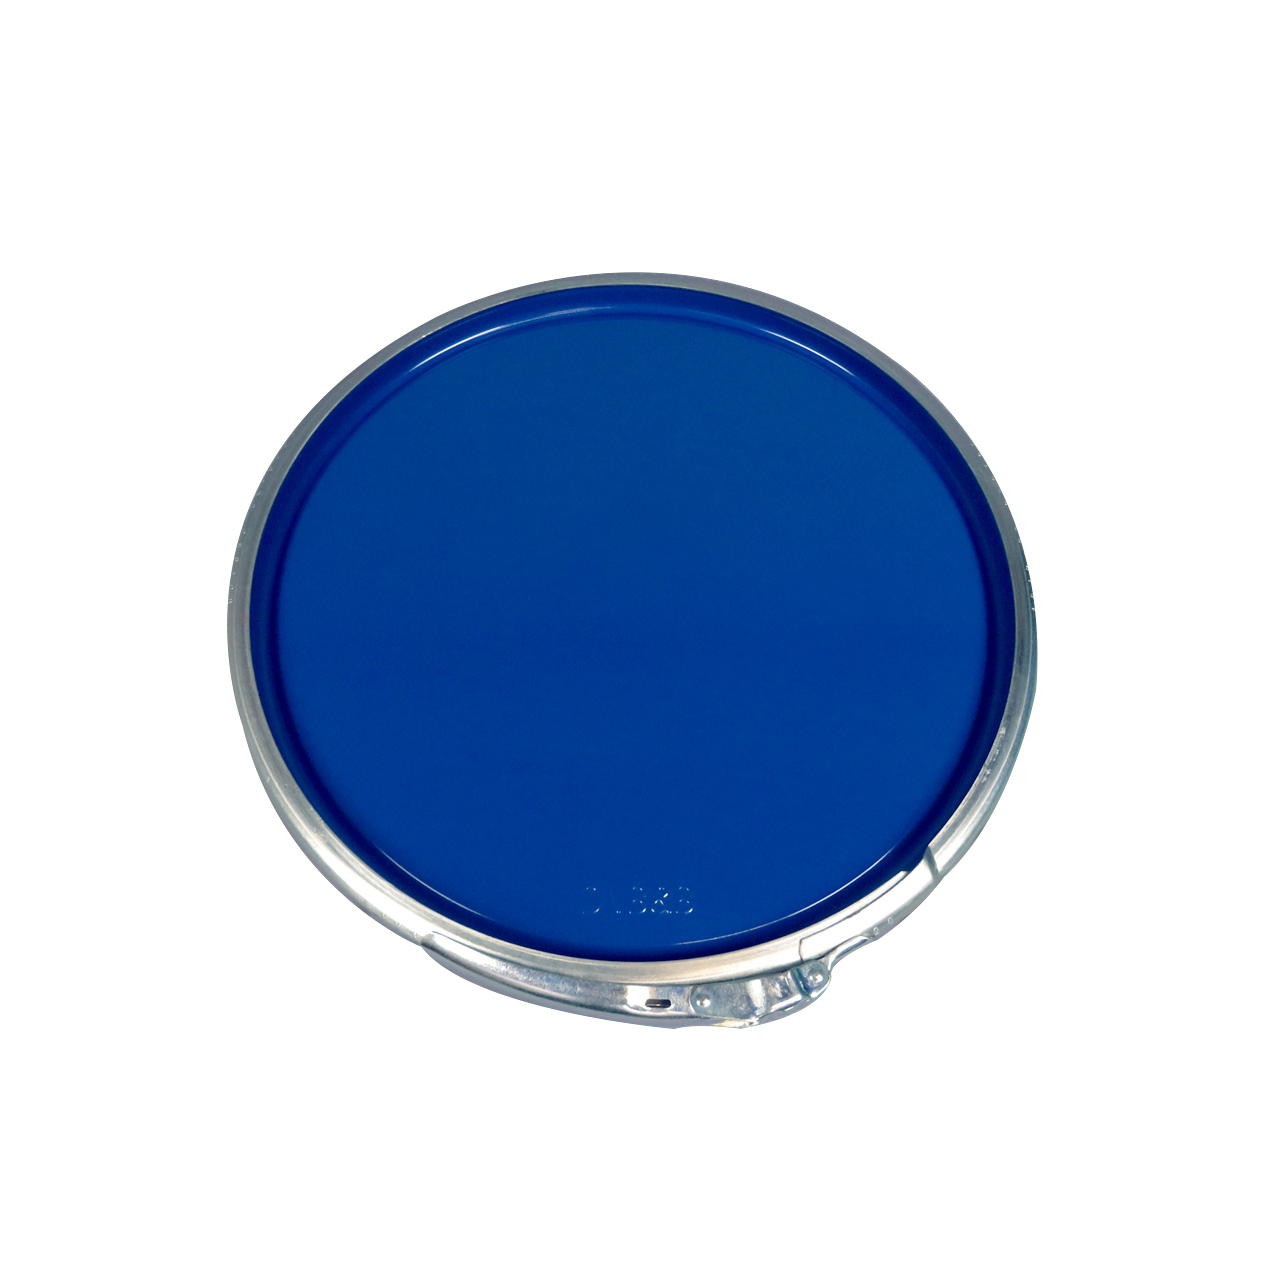 212 L Stahldeckelfass, lackiert, blau, UN (fest + flüssig)